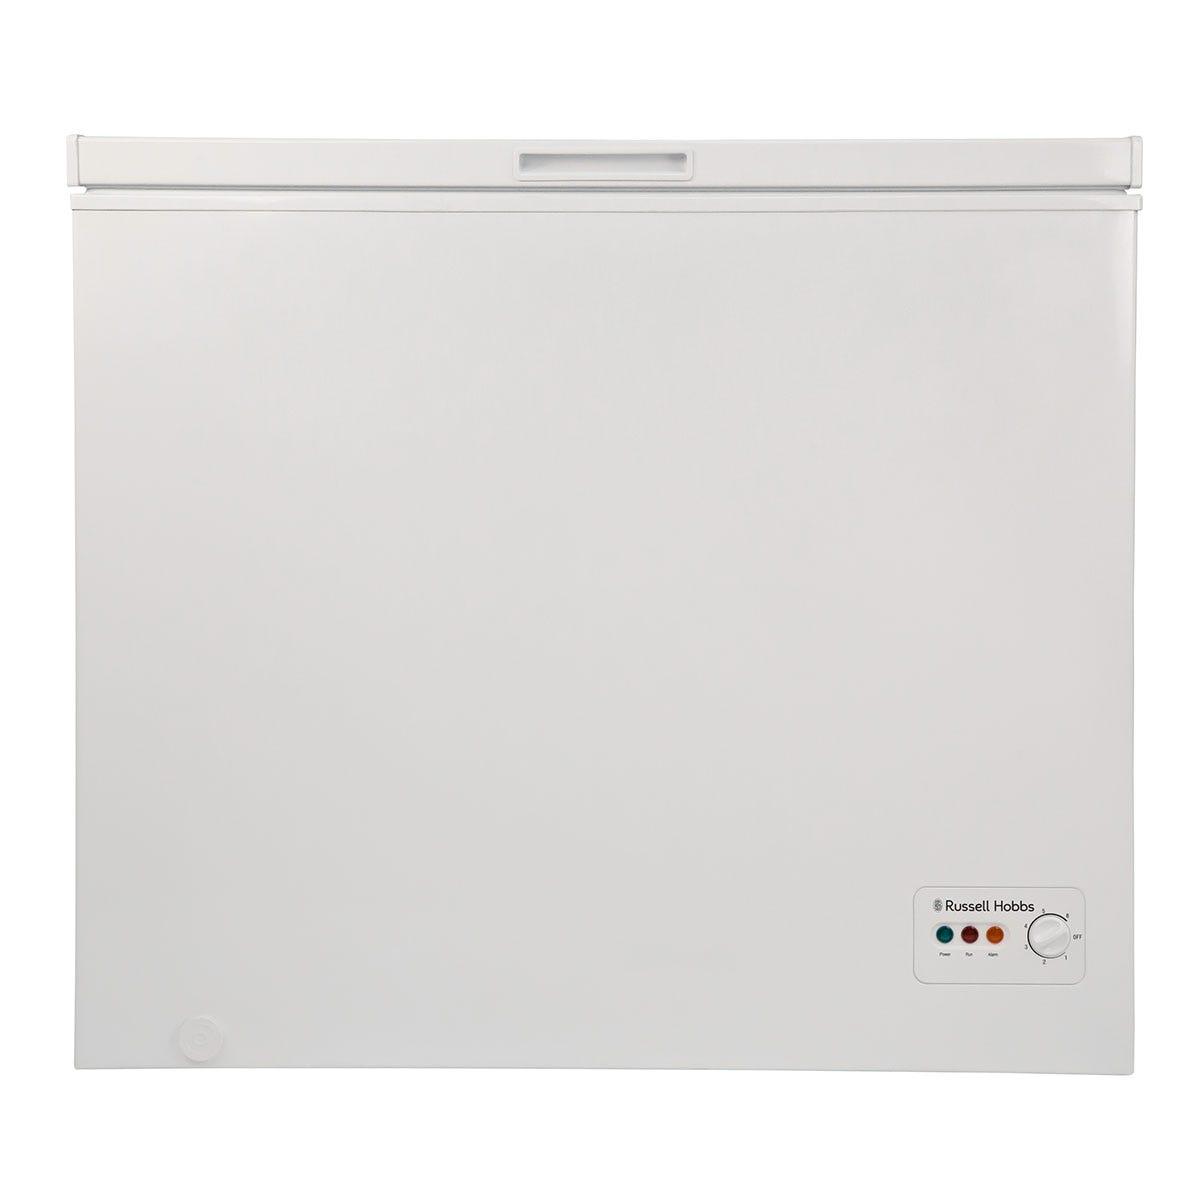 Russell Hobbs RHCF200 197L Chest Freezer - White